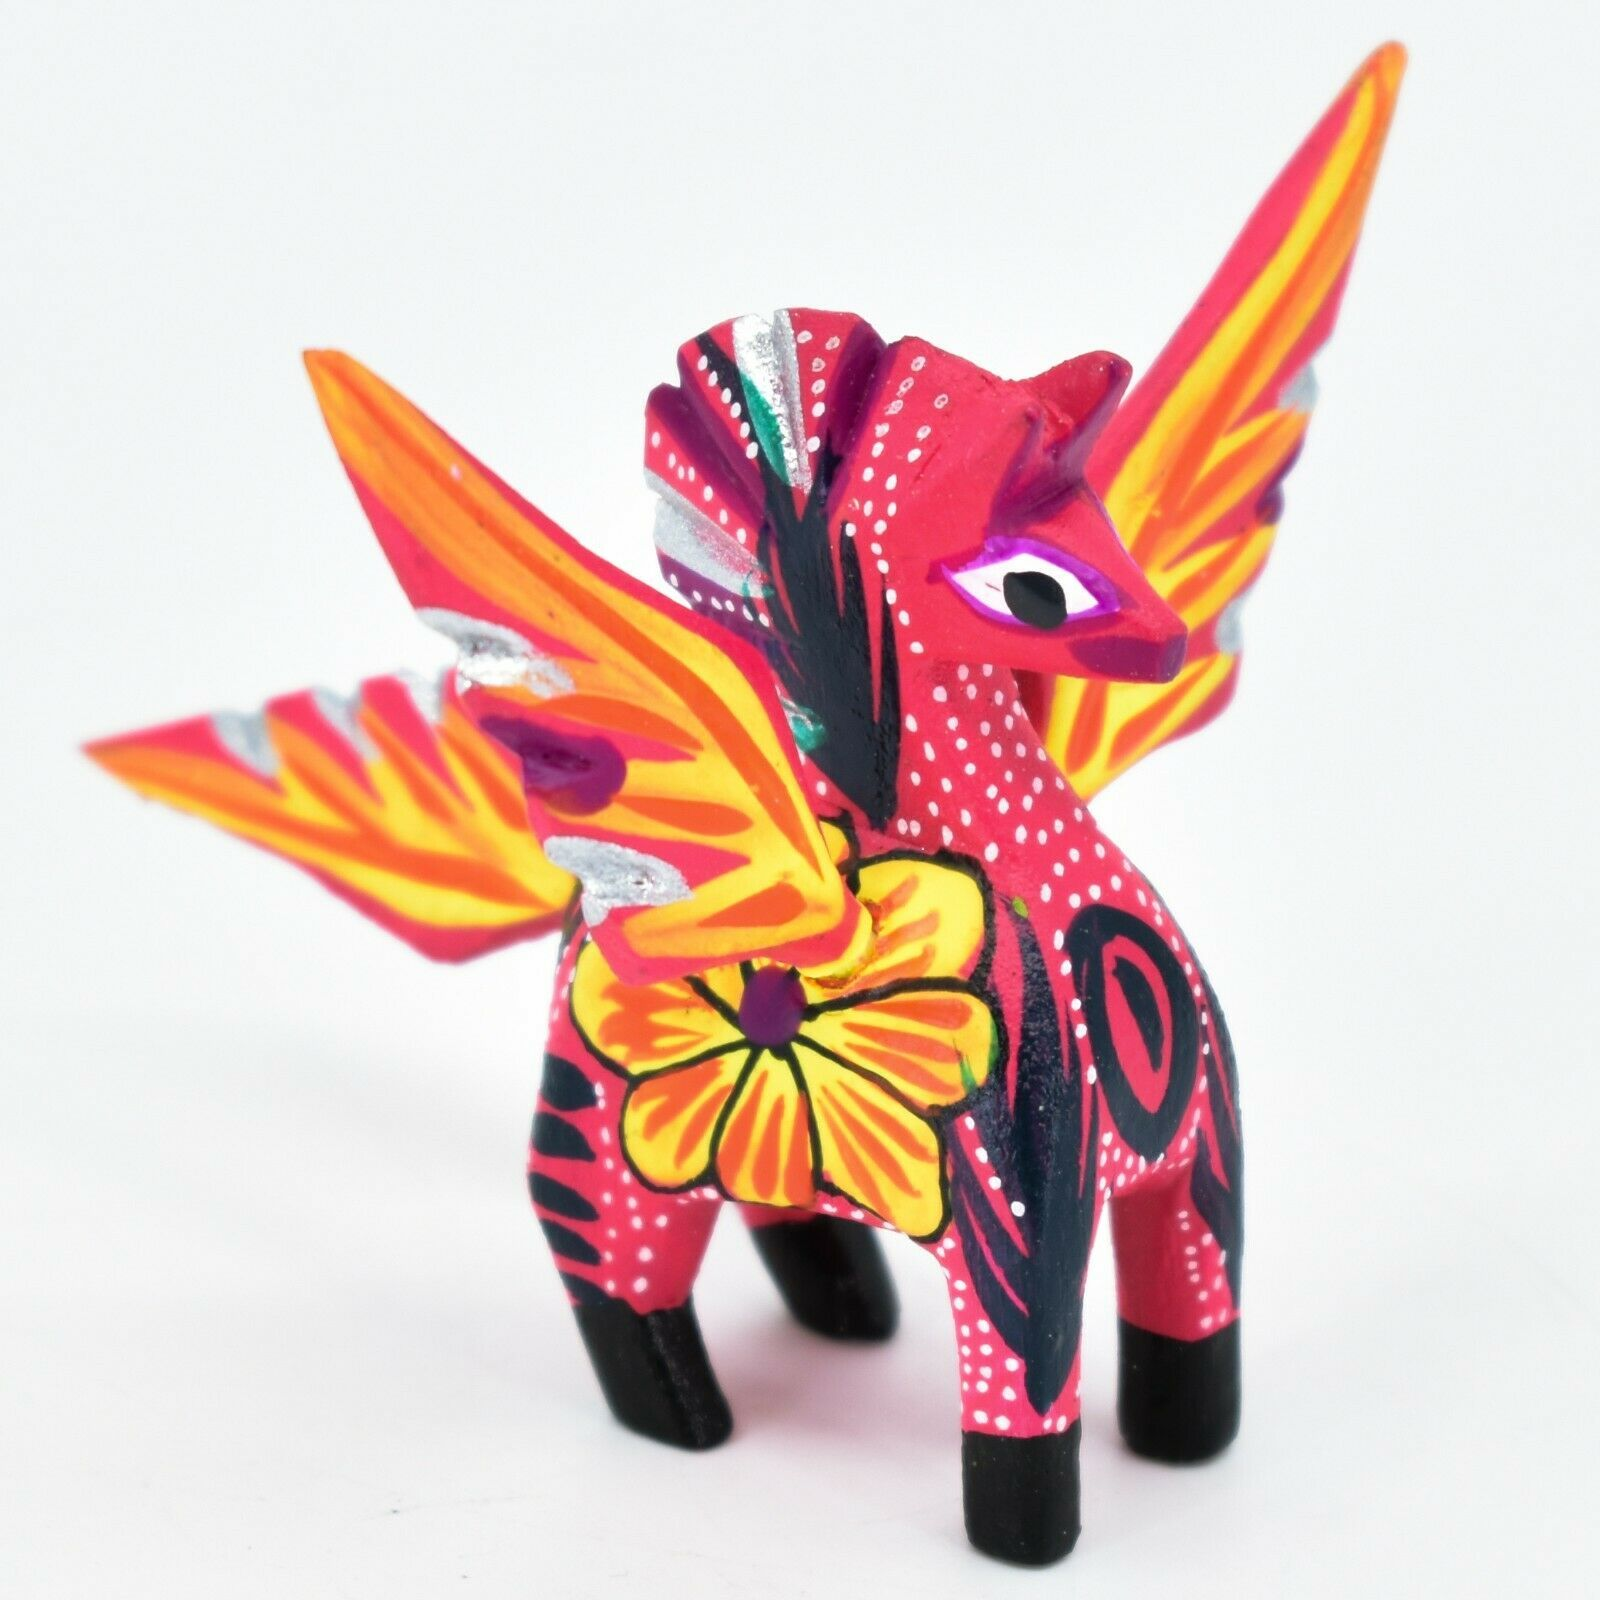 Handmade Alebrijes Oaxacan Wood Carved Folk Art Mini Pegasus Horse Figurine